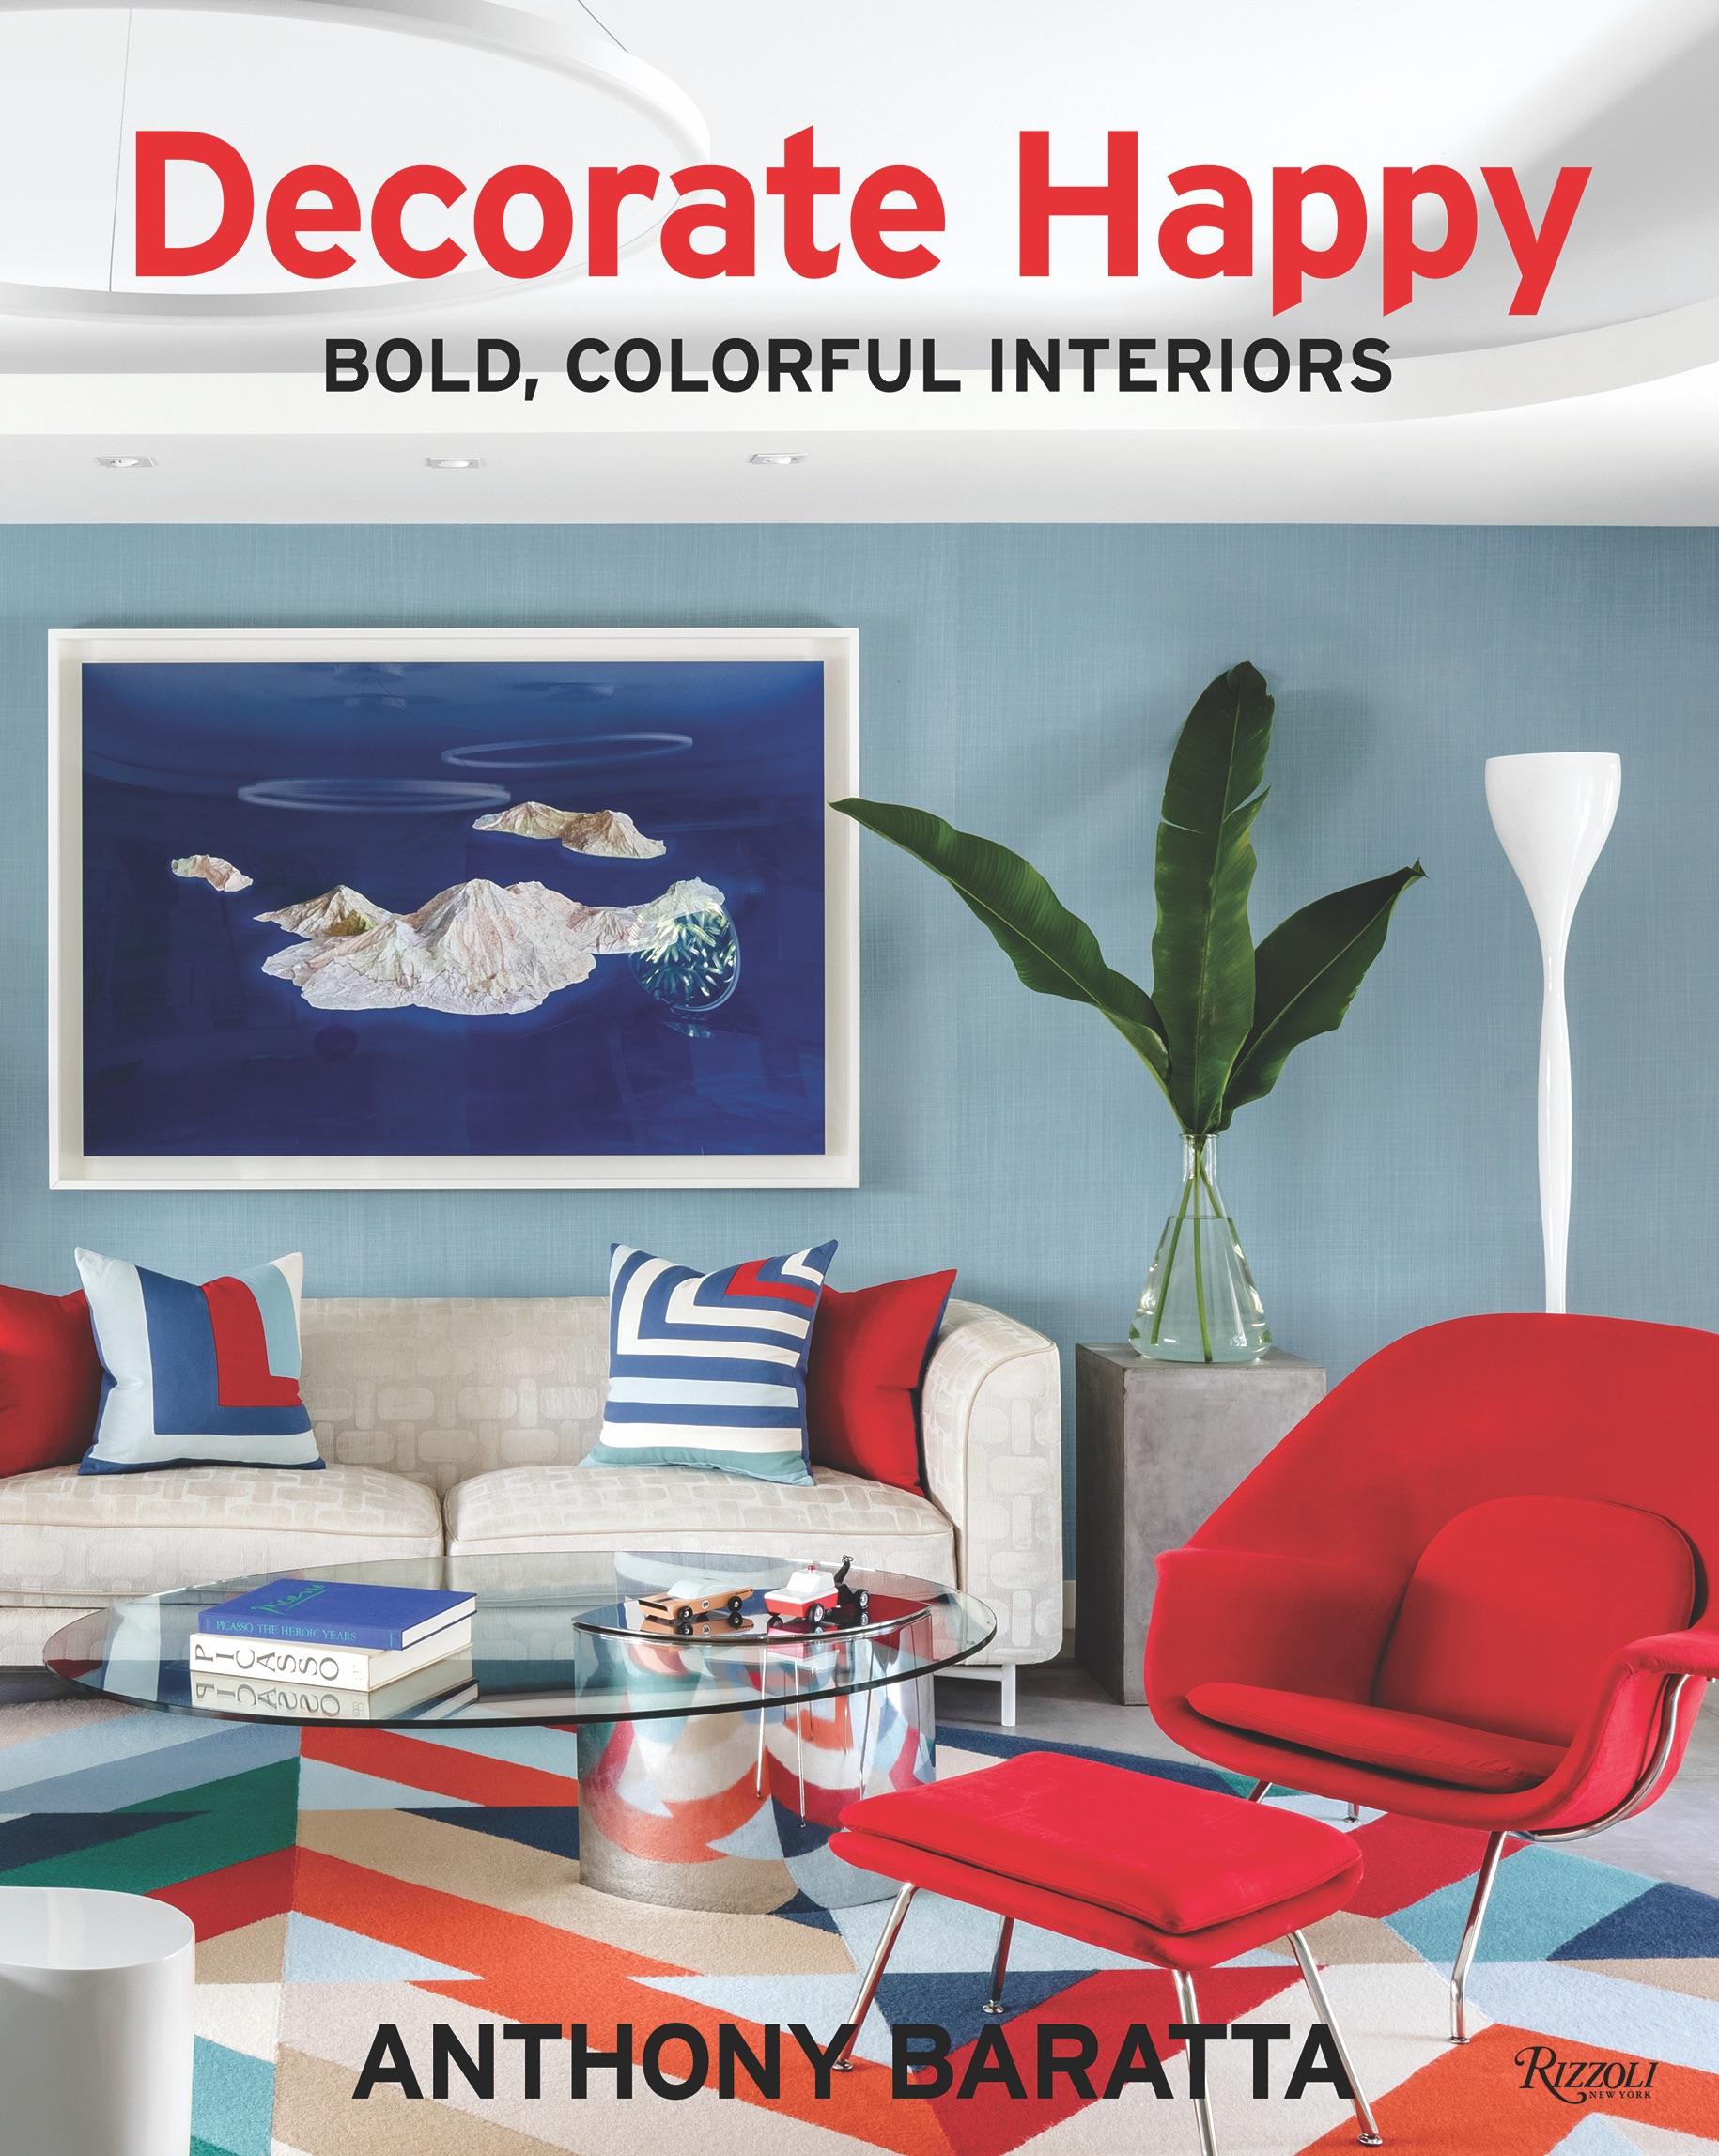 Decoratehappy Cover